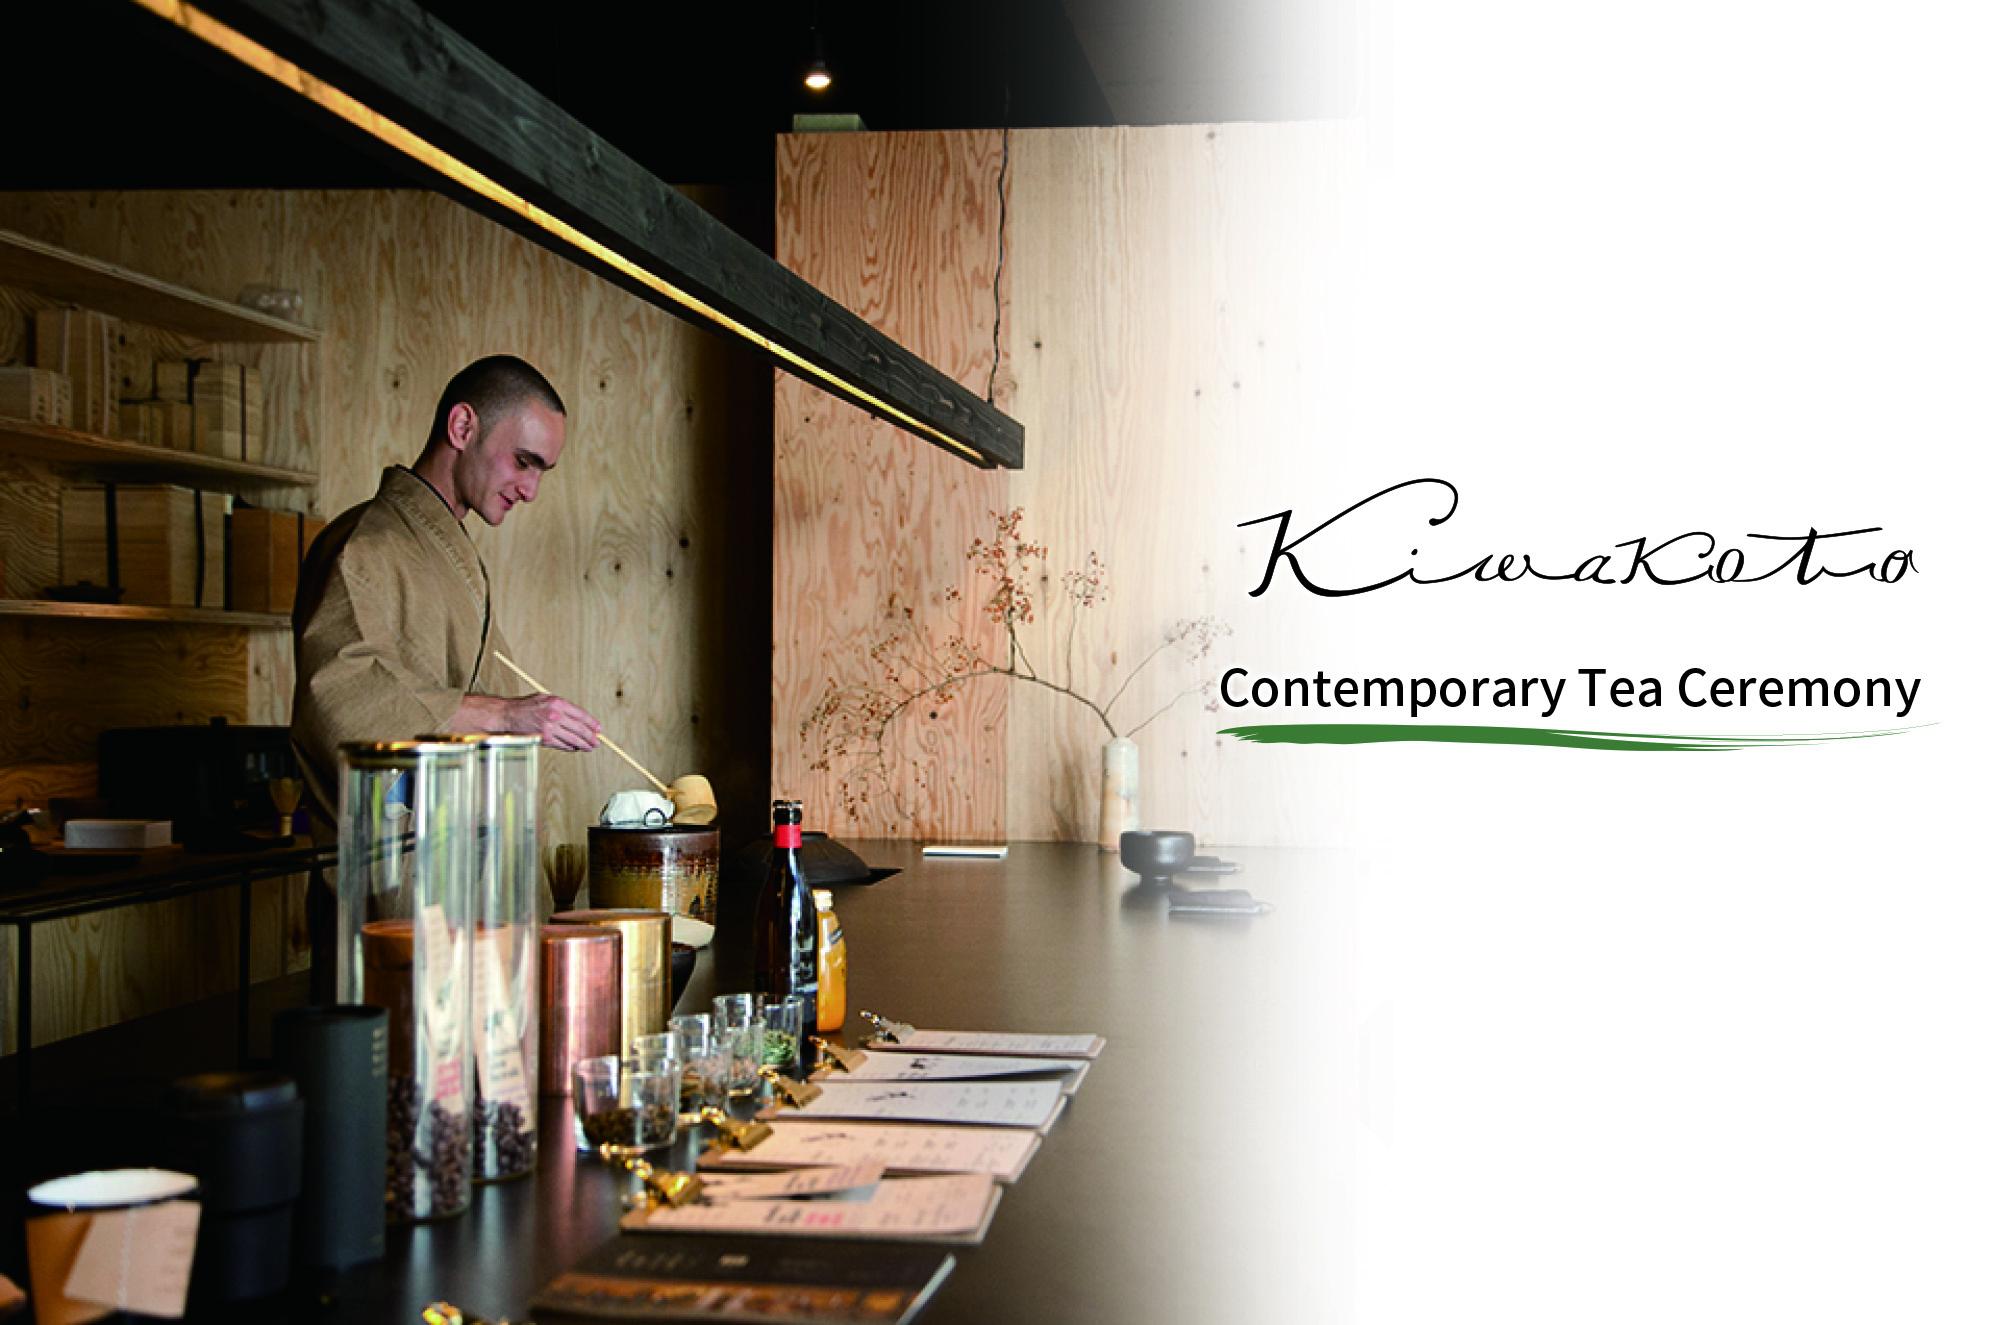 Contemporary Tea Ceremonyのチラシ